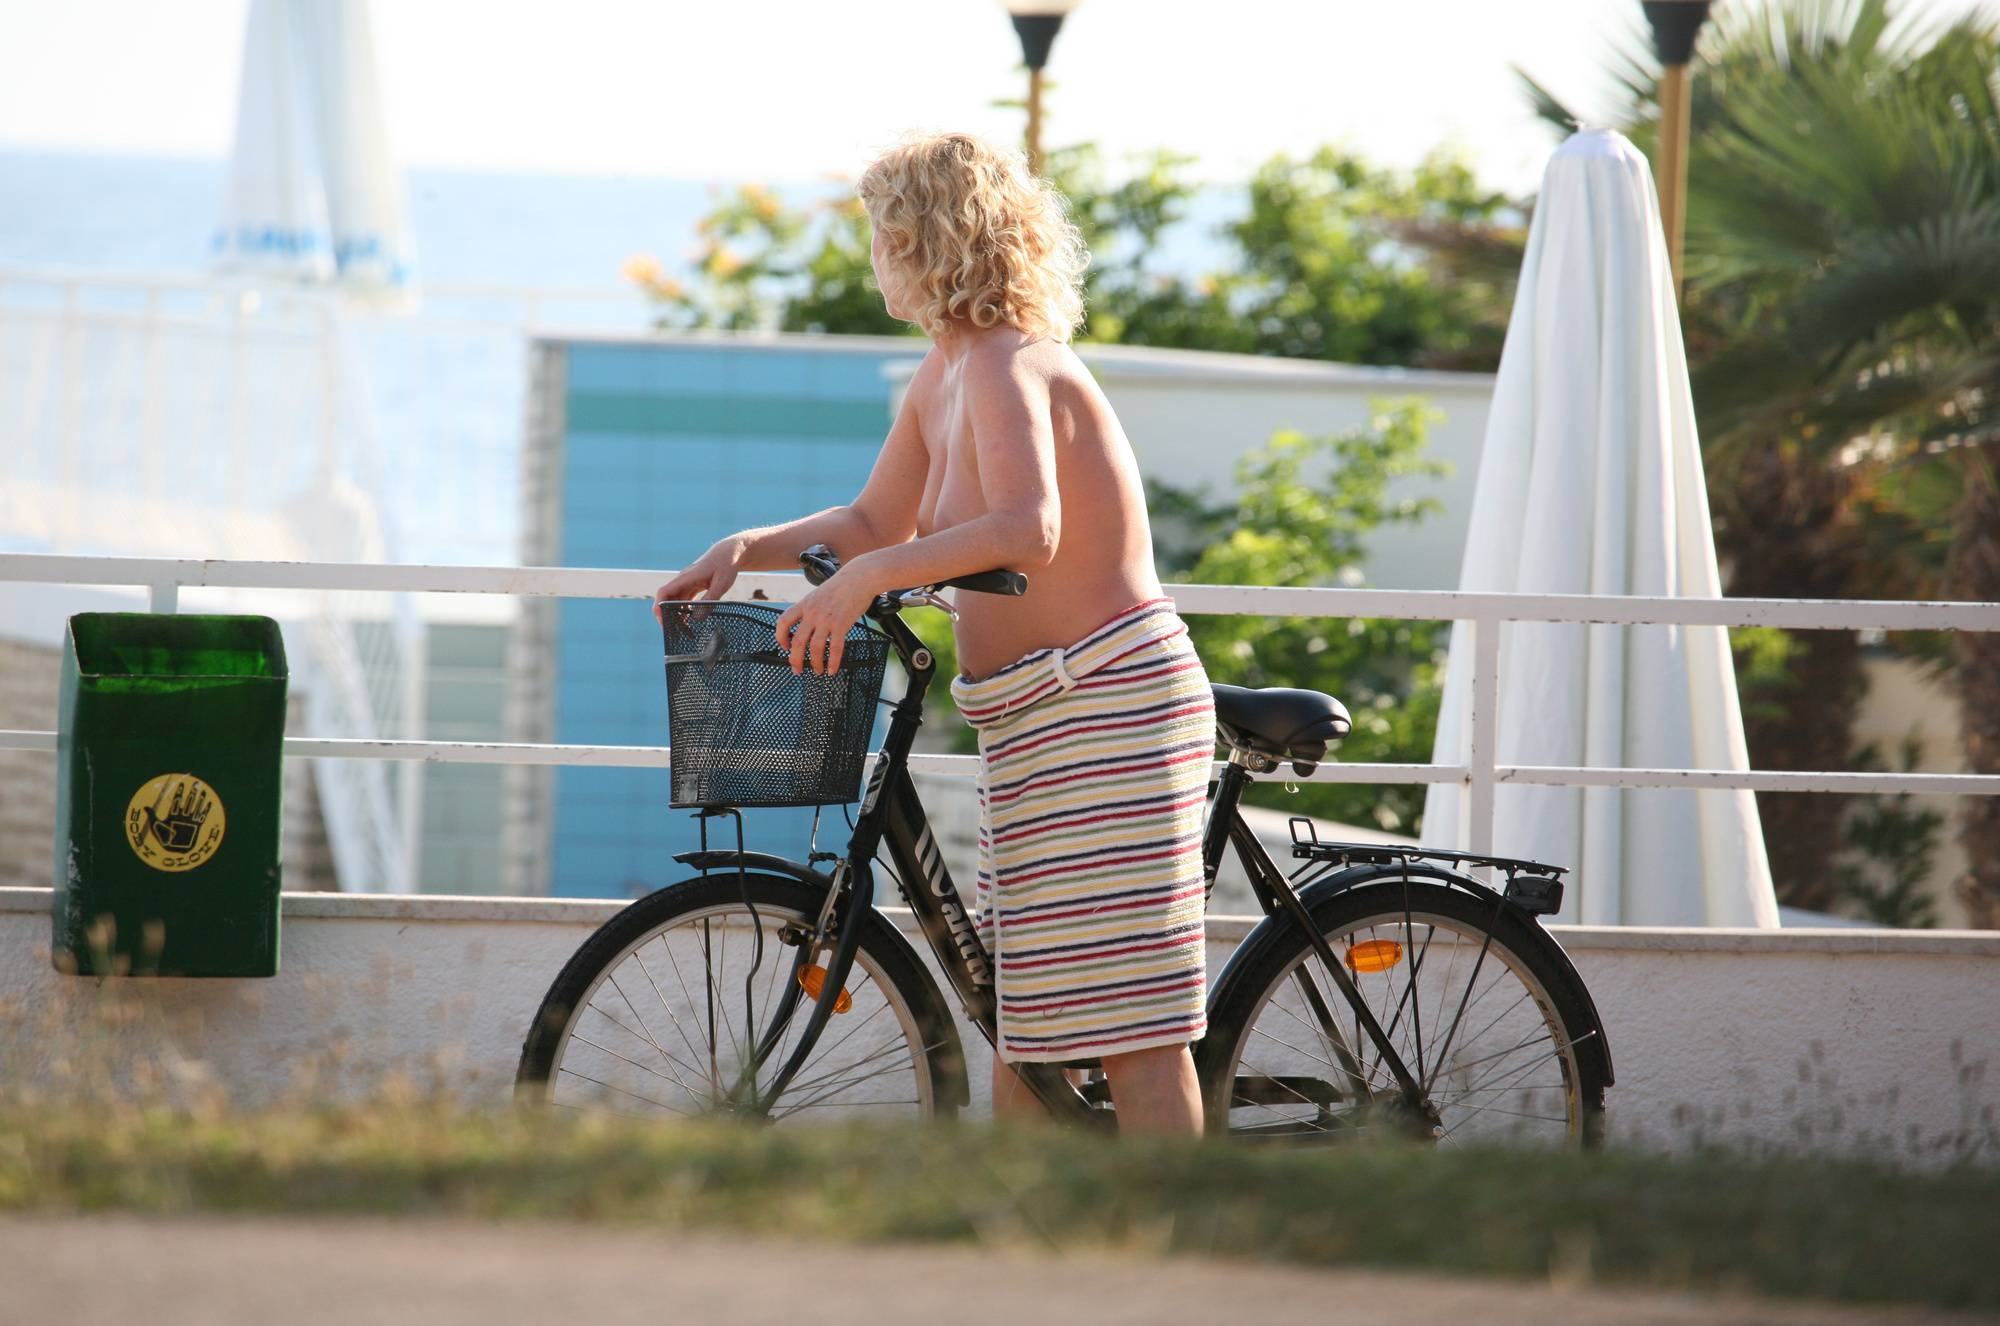 Purenudism Pics Nora FKK Outdoor Biking - 3